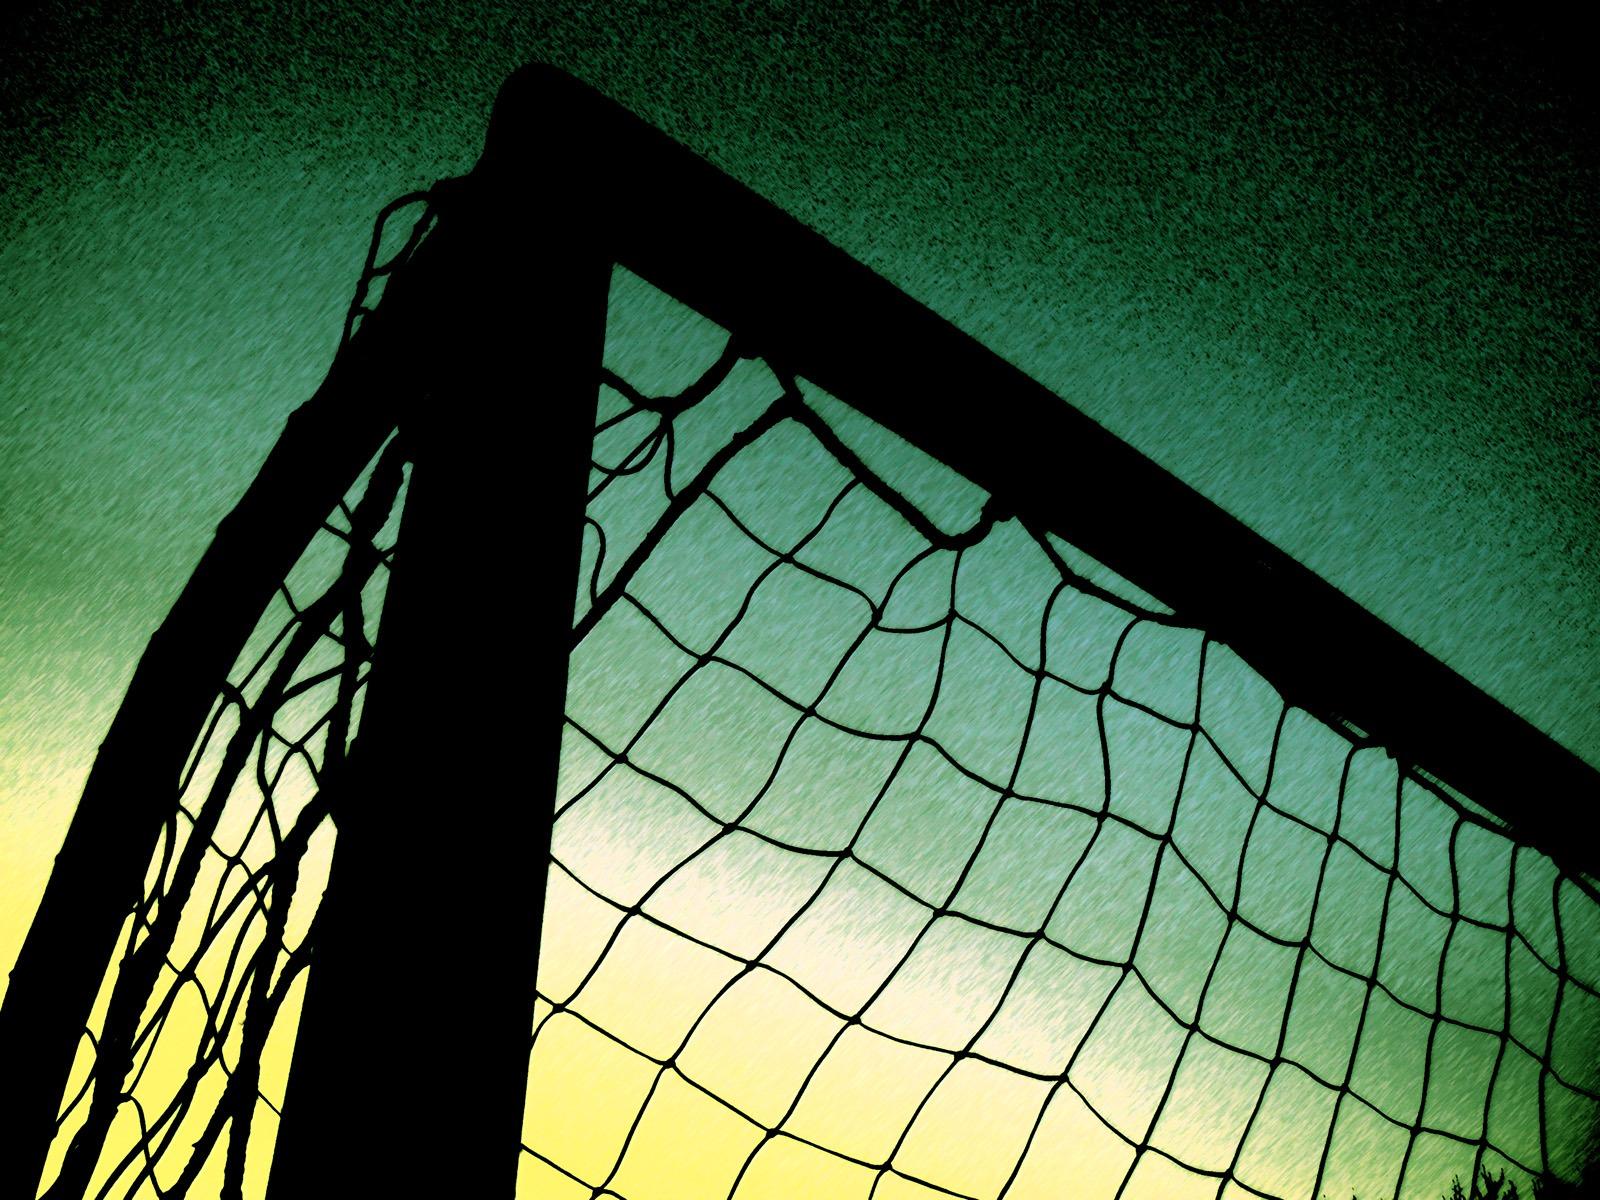 Goal. by Linek